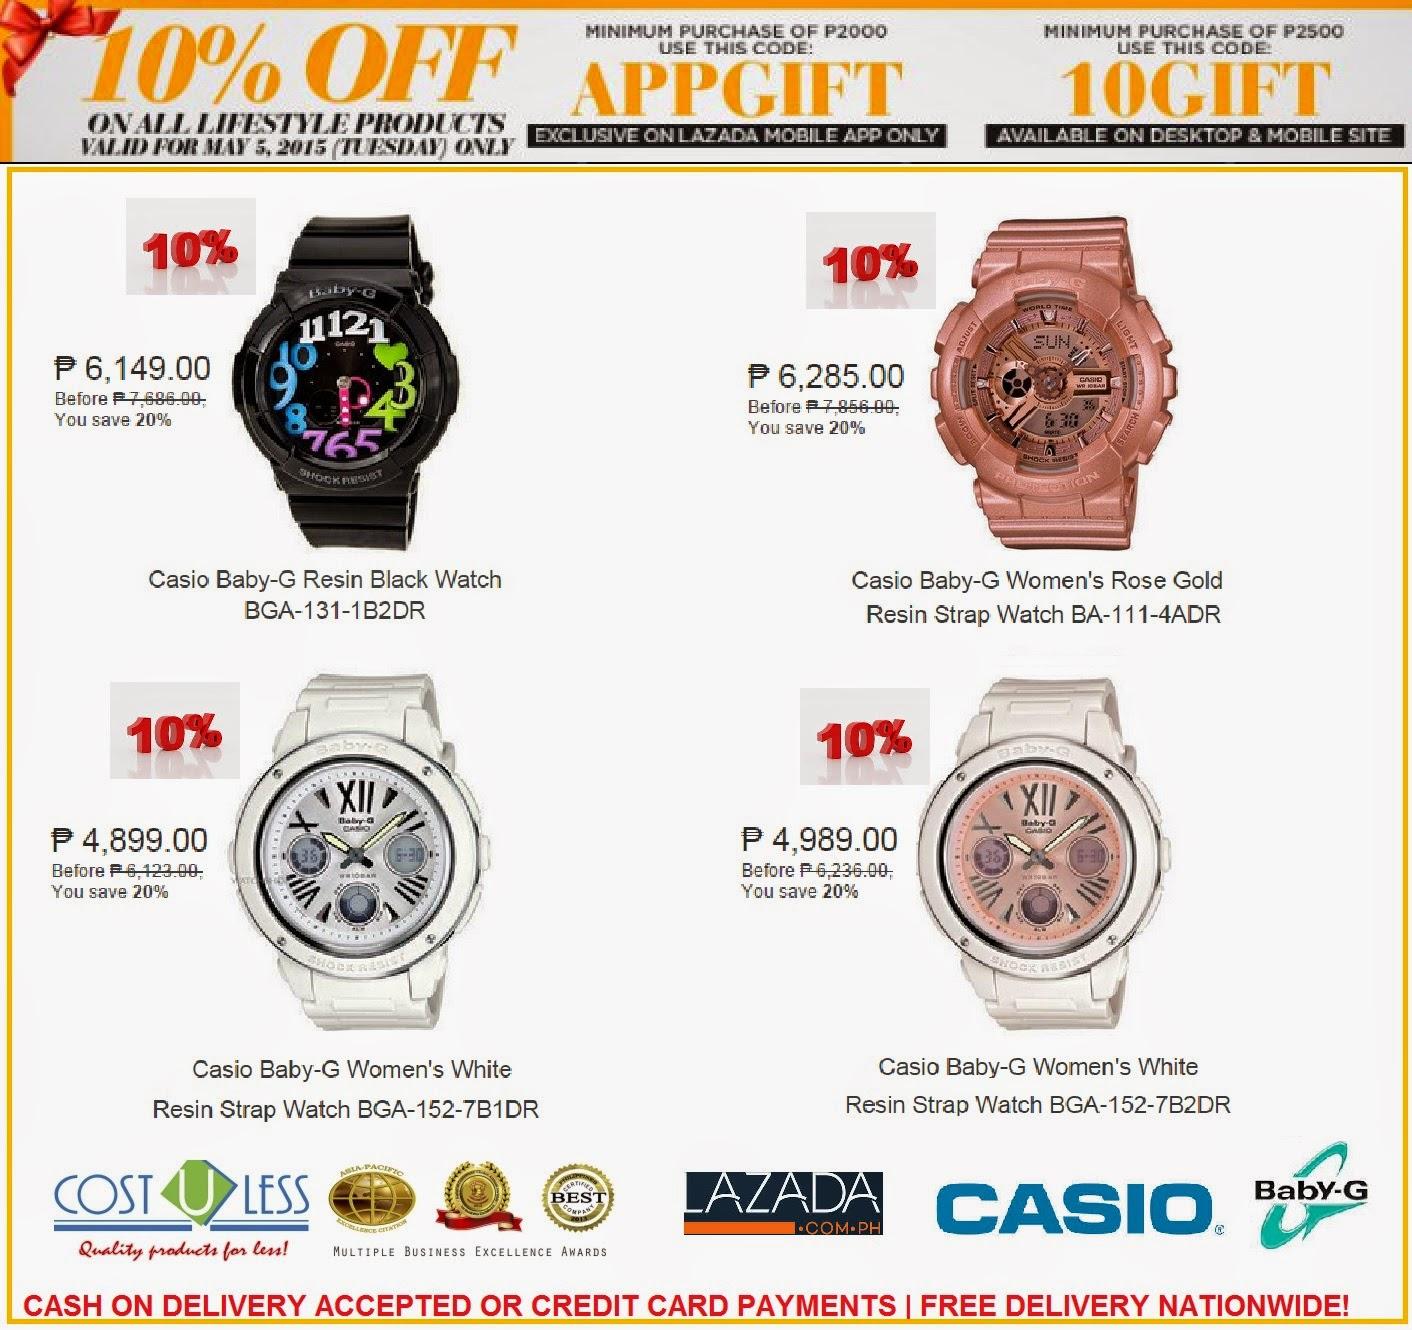 823d055d51f5 Cost U Less-Office Furniture Manila